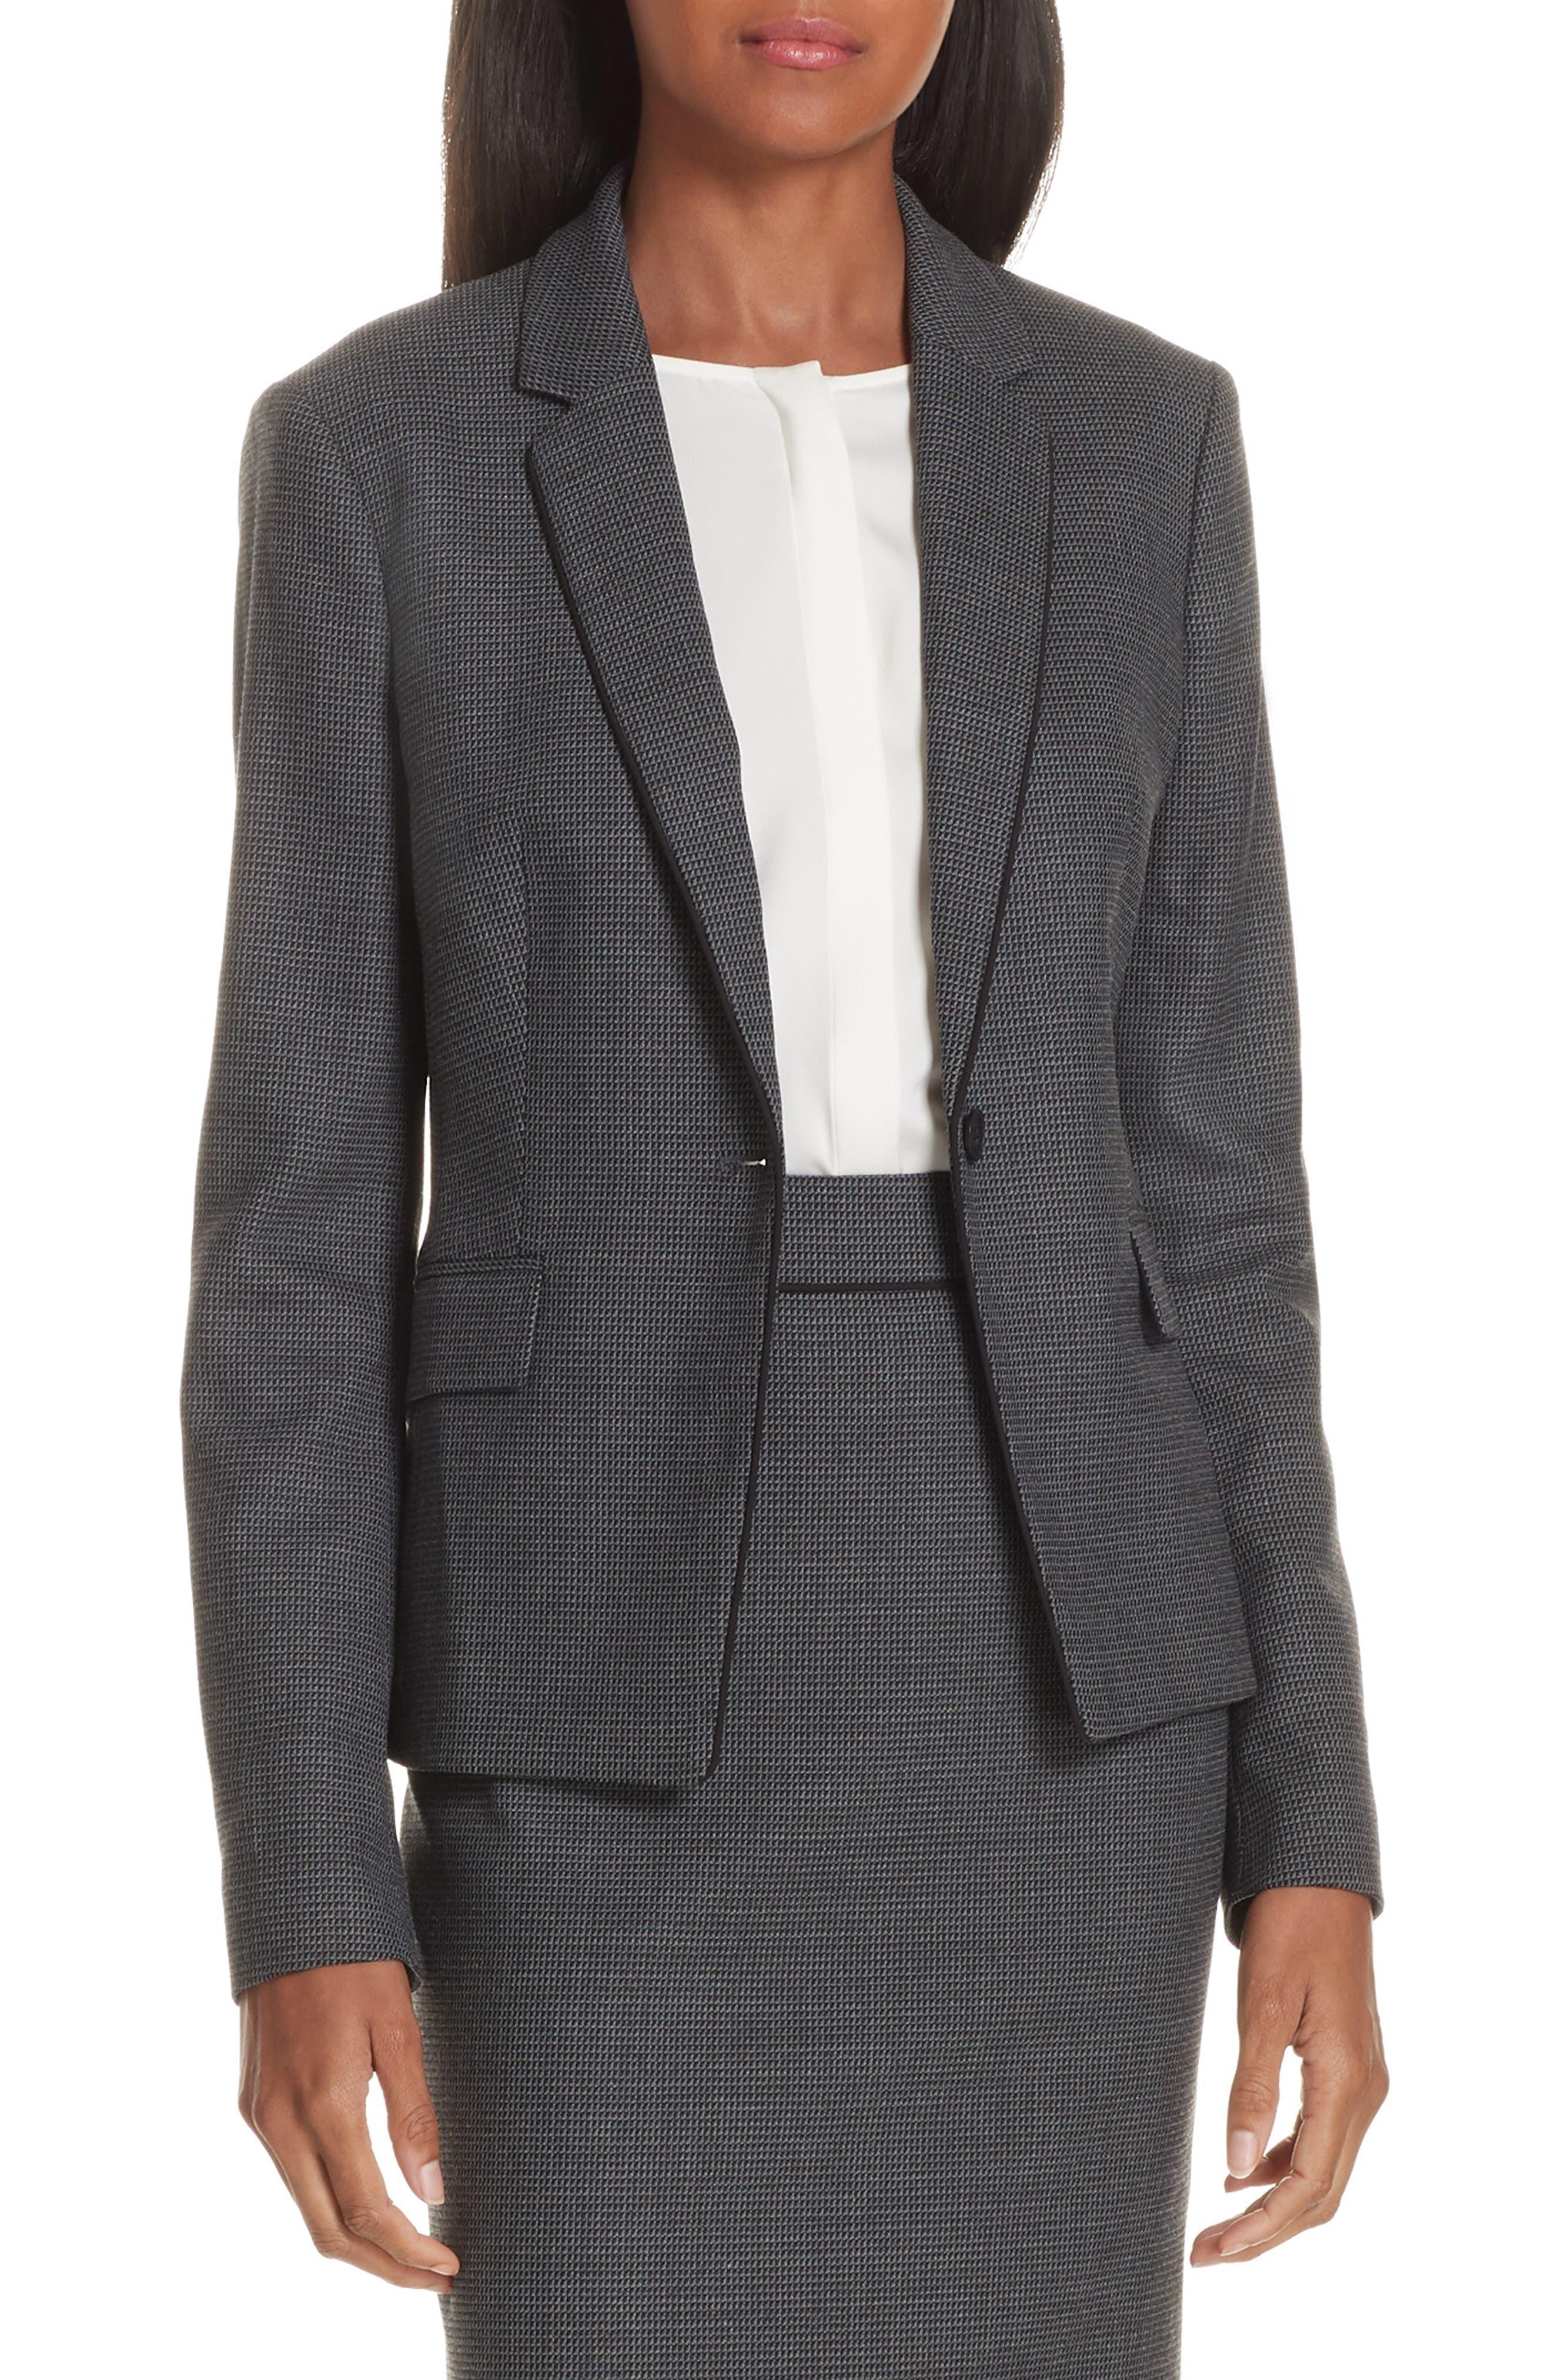 Jorita Geometric Wool Blend Suit Jacket,                             Main thumbnail 1, color,                             GREY FANTASY